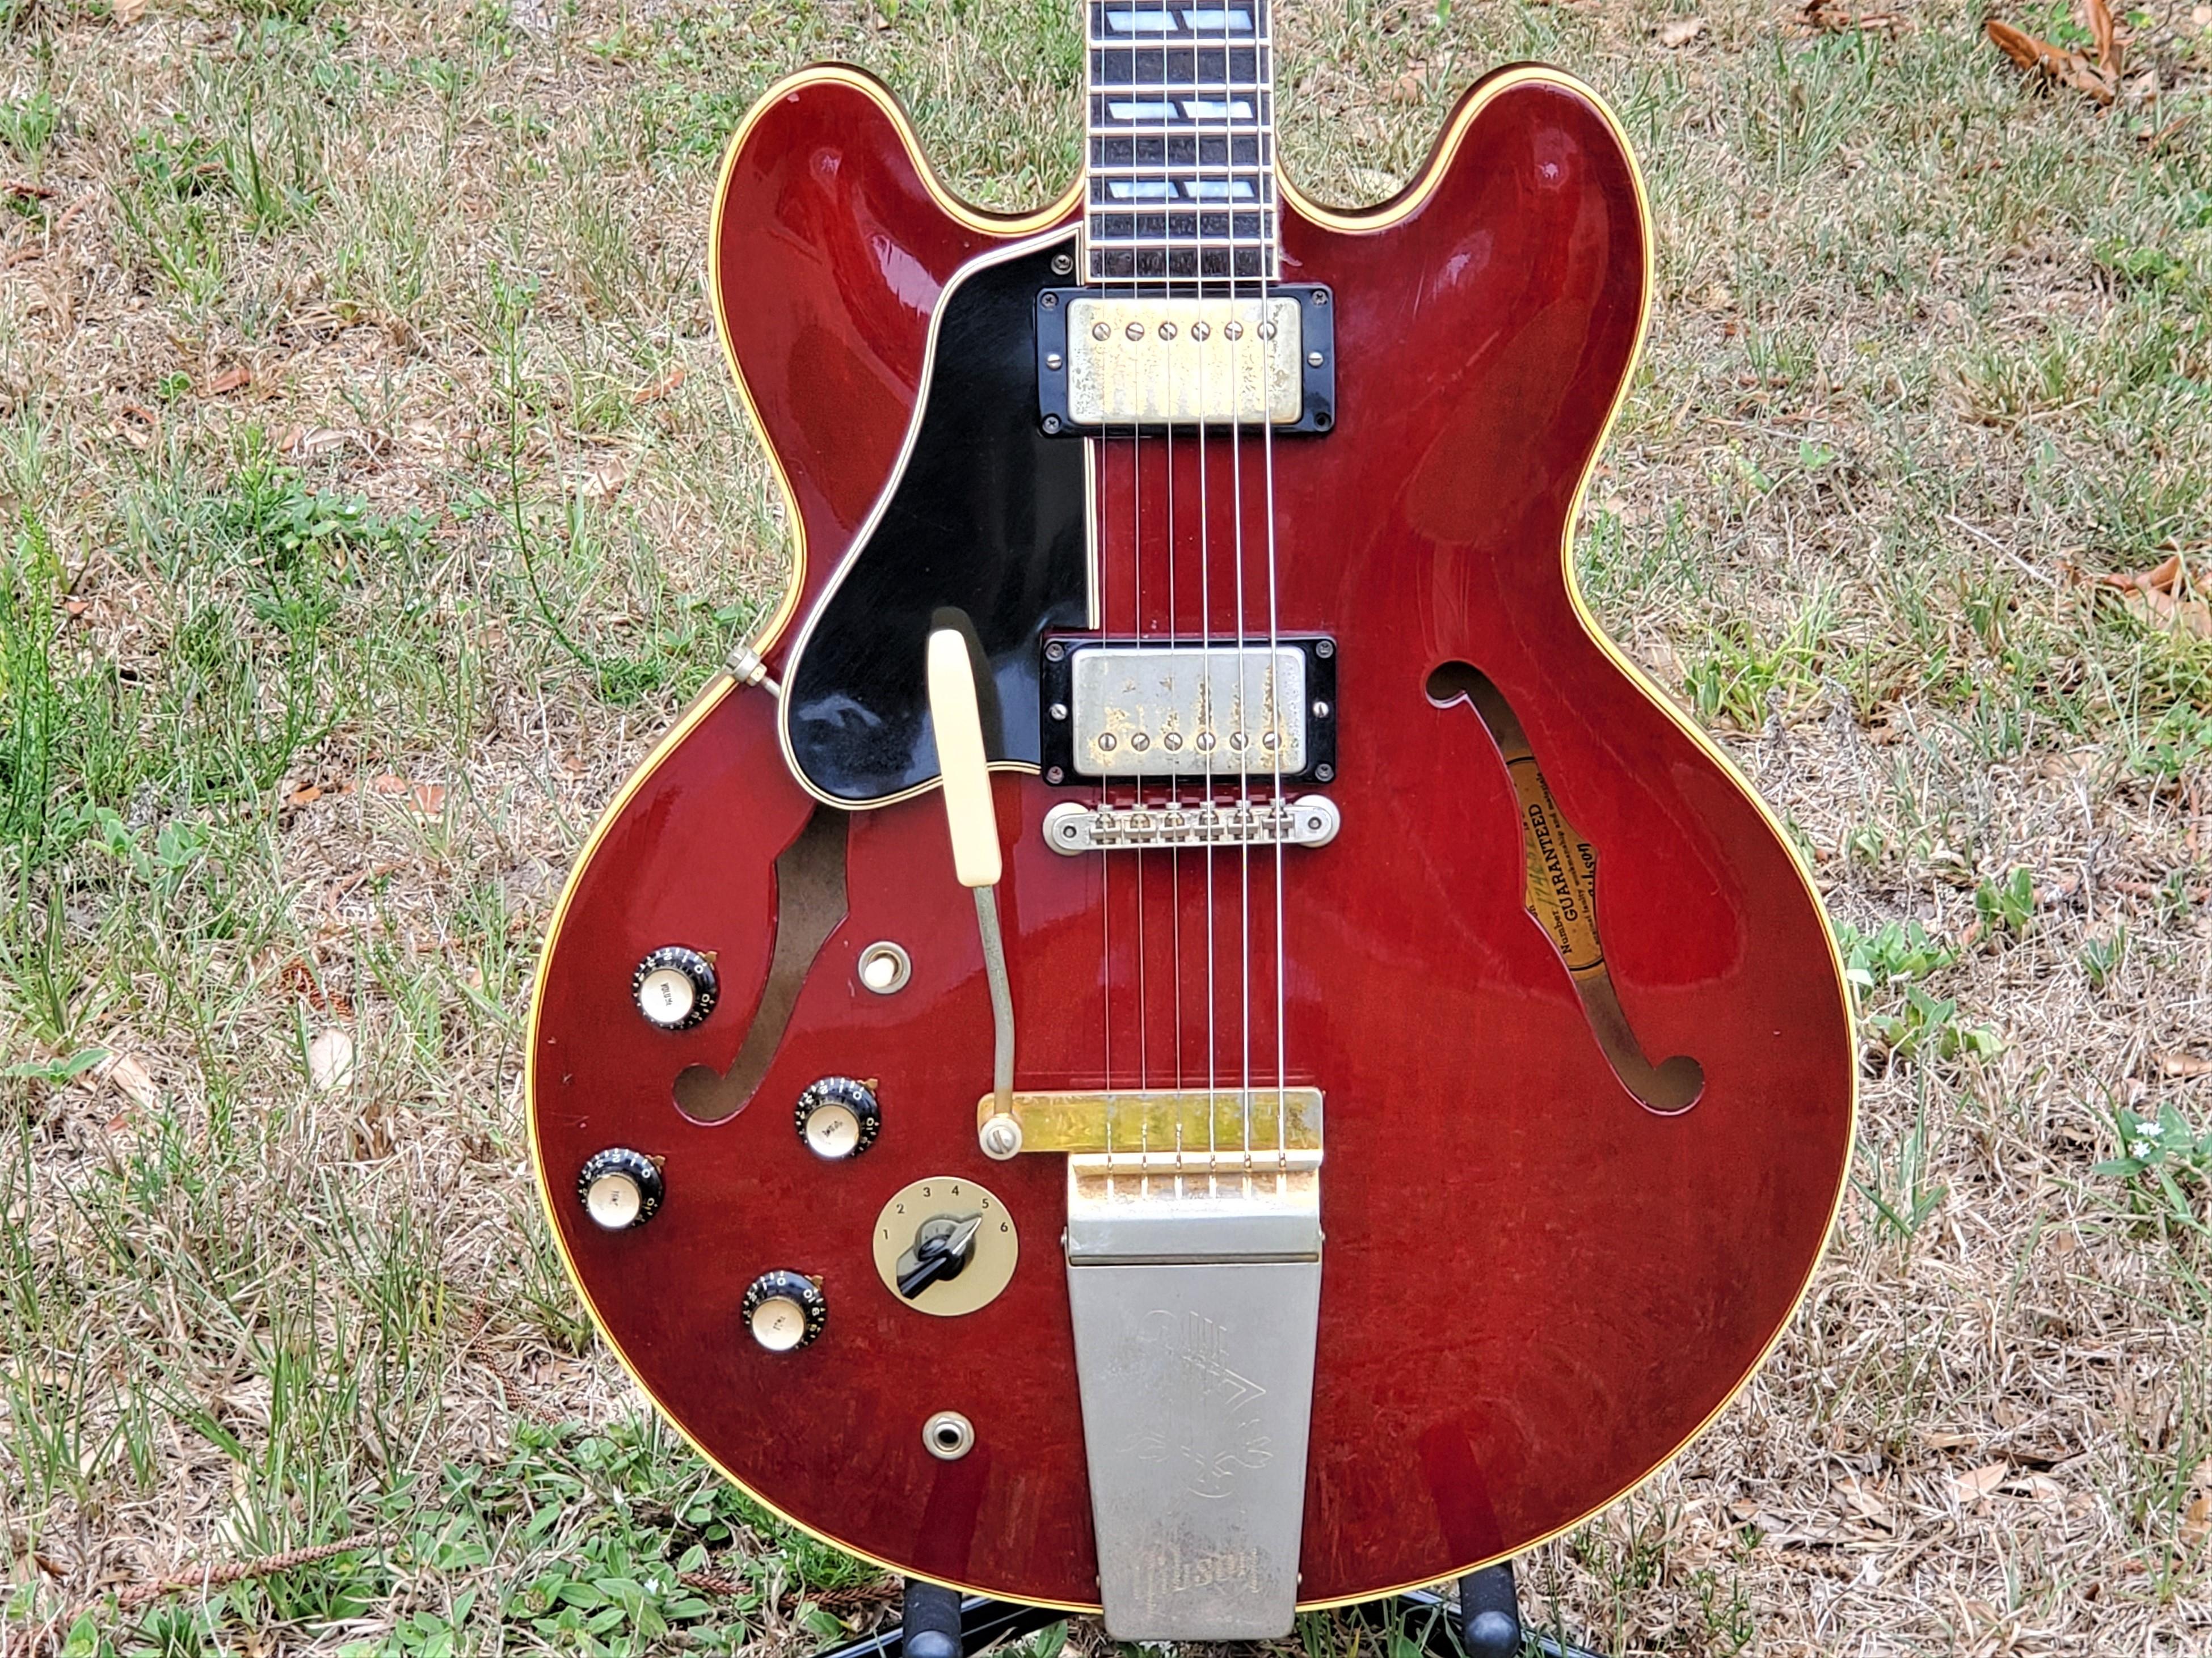 1967 Gibson Sg Wiring Harness Wiring Diagram Forward